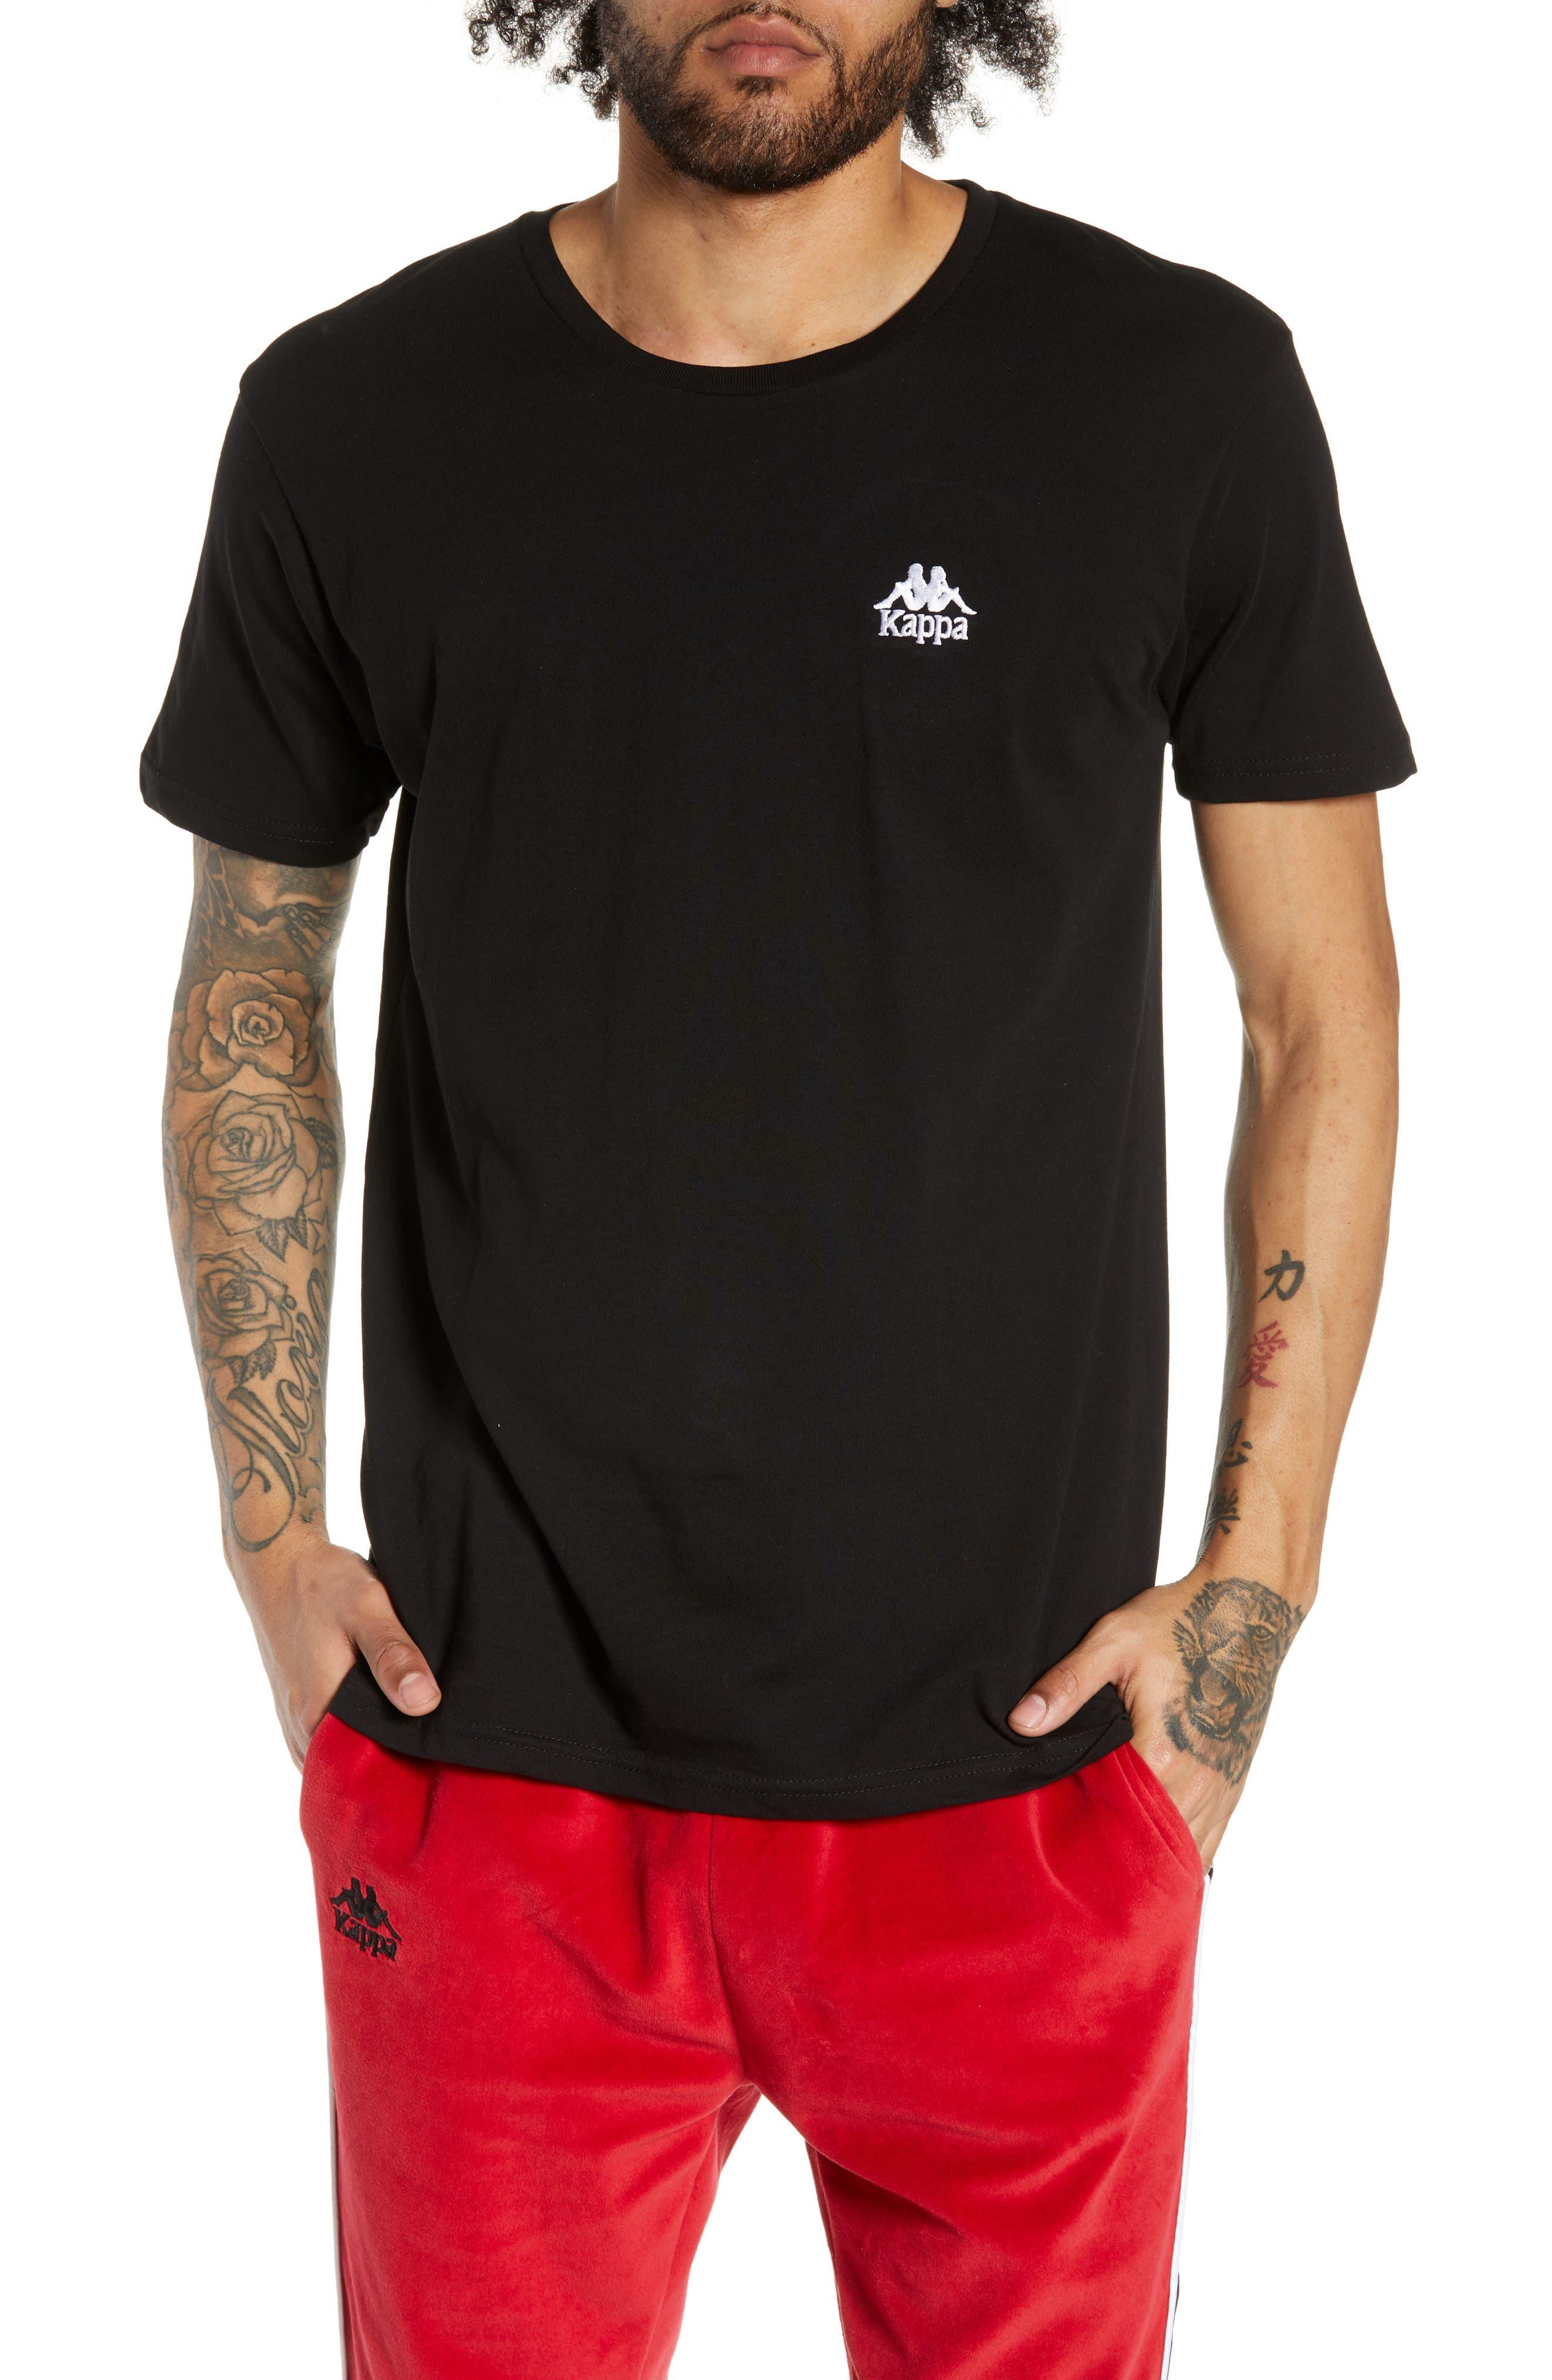 Kappa Active Authentic Bzalaya Logo T-Shirt, Black